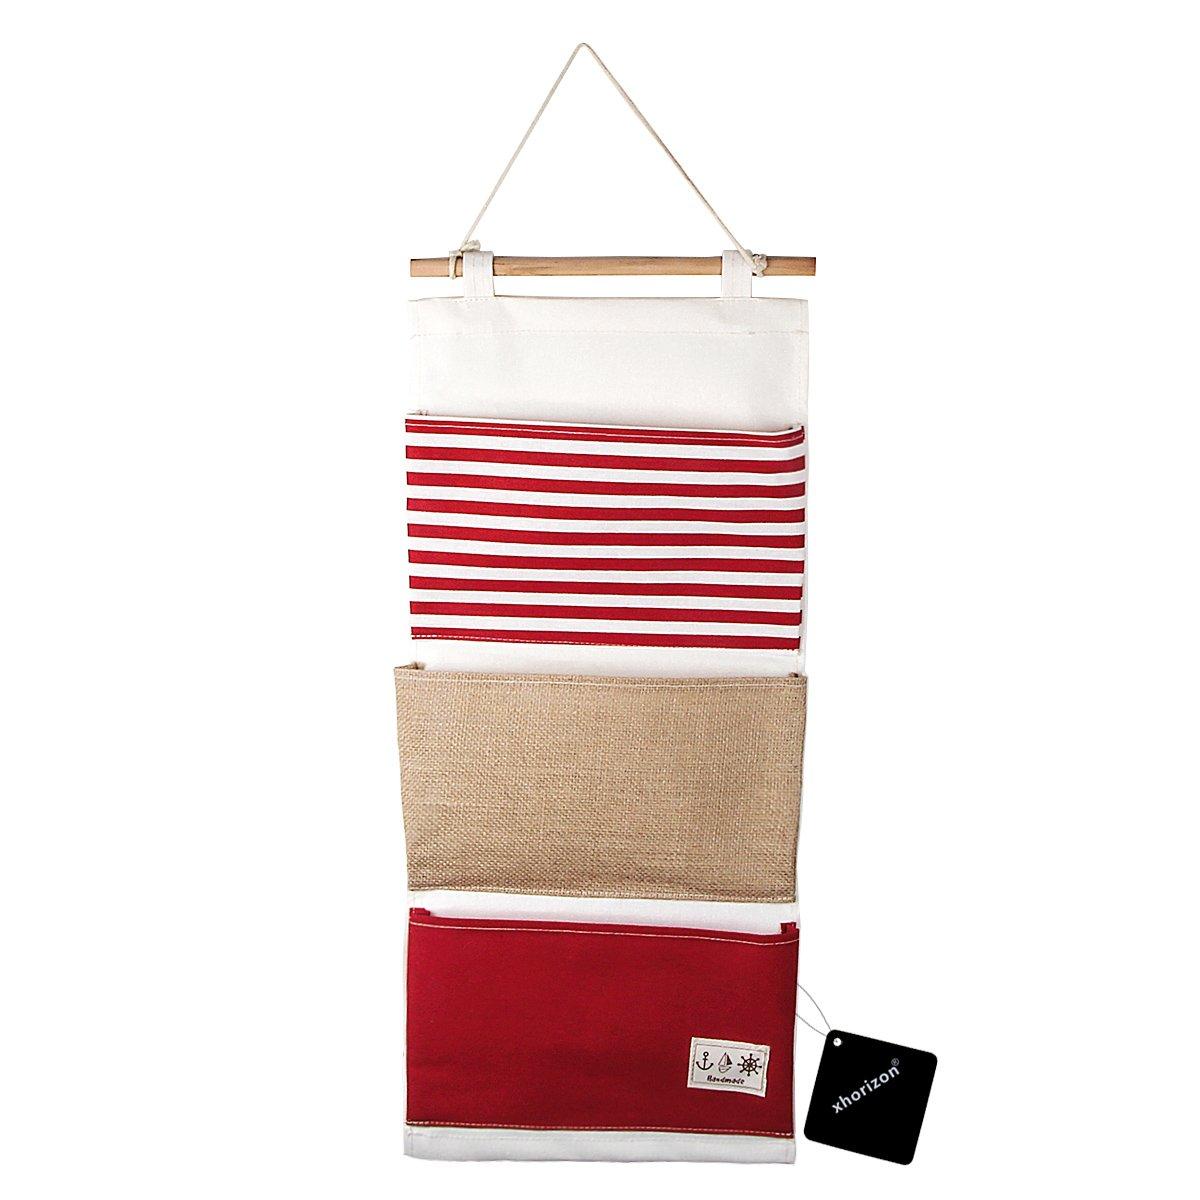 xhorizon TM FL1 Linen/Cotton Fabric 3 Pockets Wall Door Closet Hanging Storage Bag Organizer (Blue)